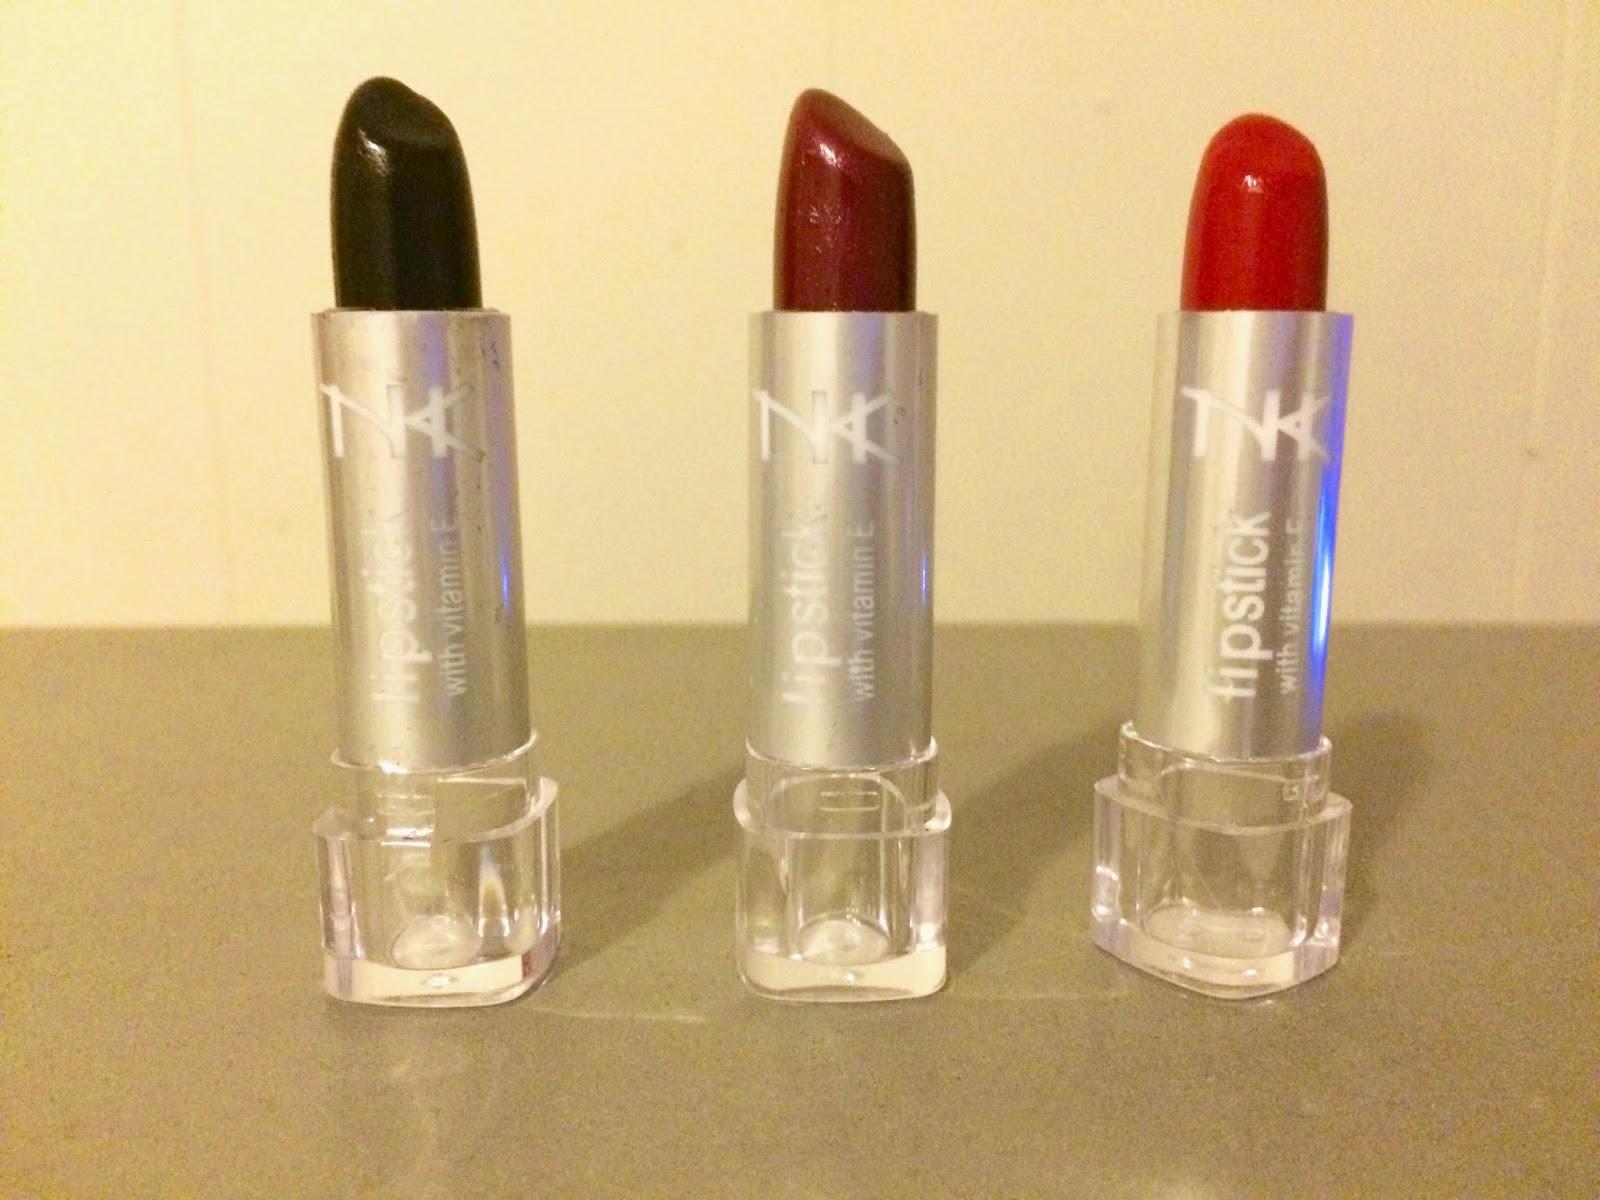 Christopher Stewart, lipstick, lifestyle, eating fabulously,